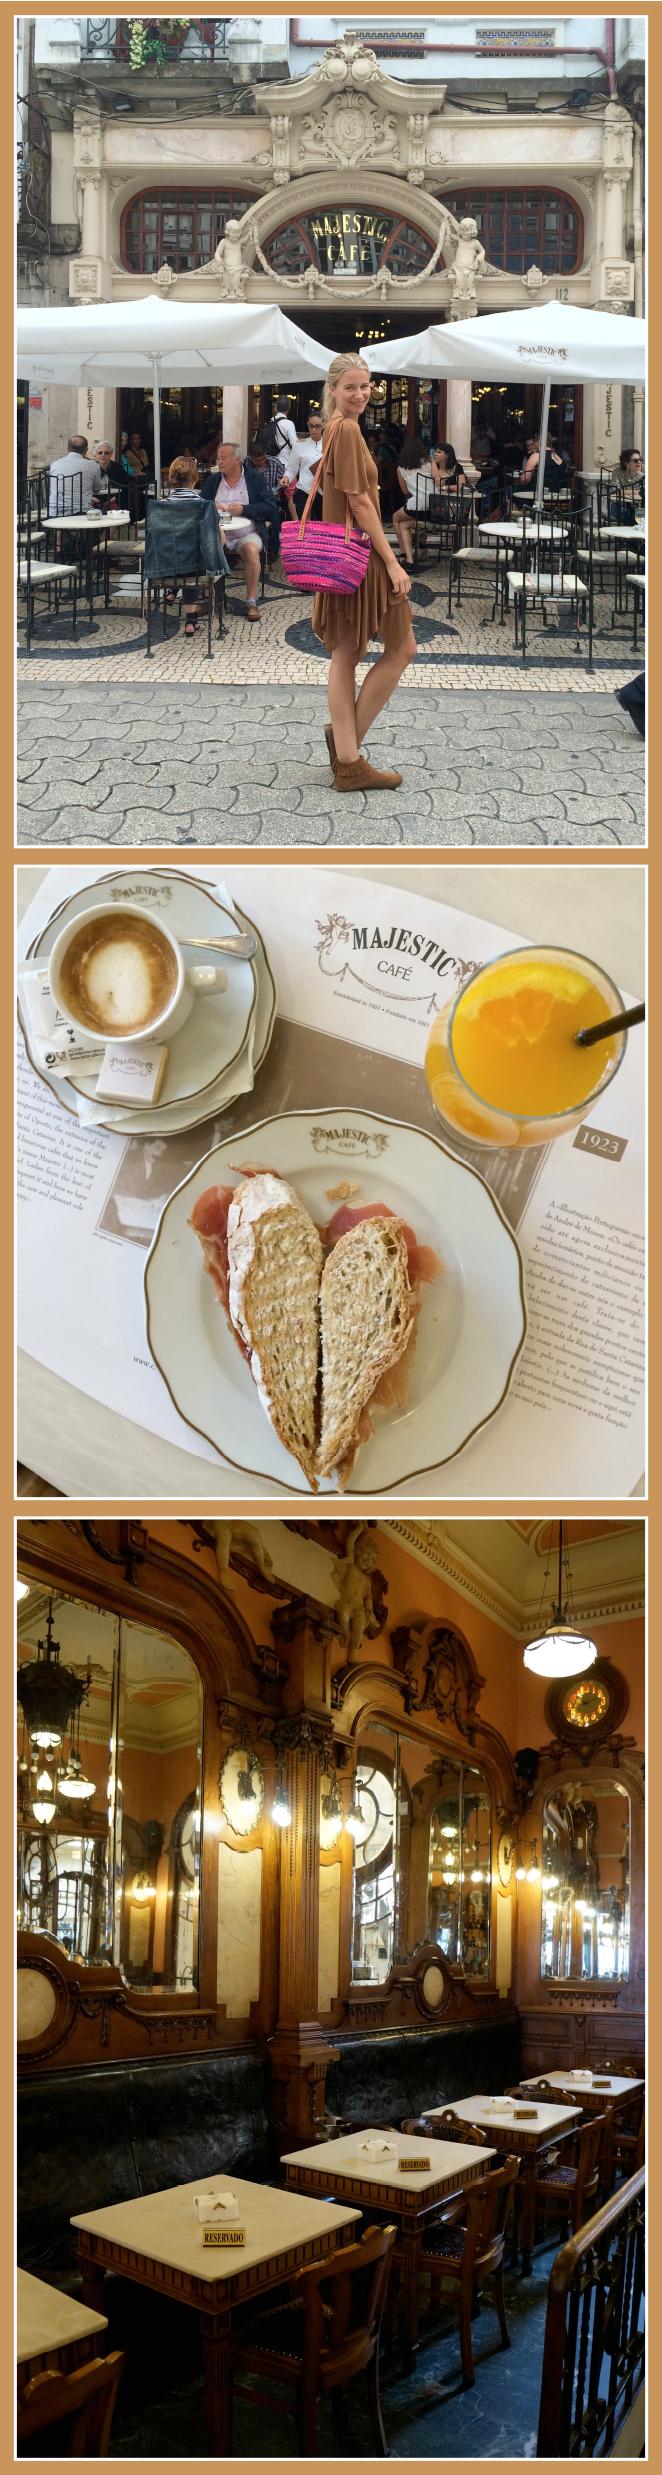 "Cafe Majestic de estilo ""Art Noveau"", ideal para desayunar o tomar café por la tarde"